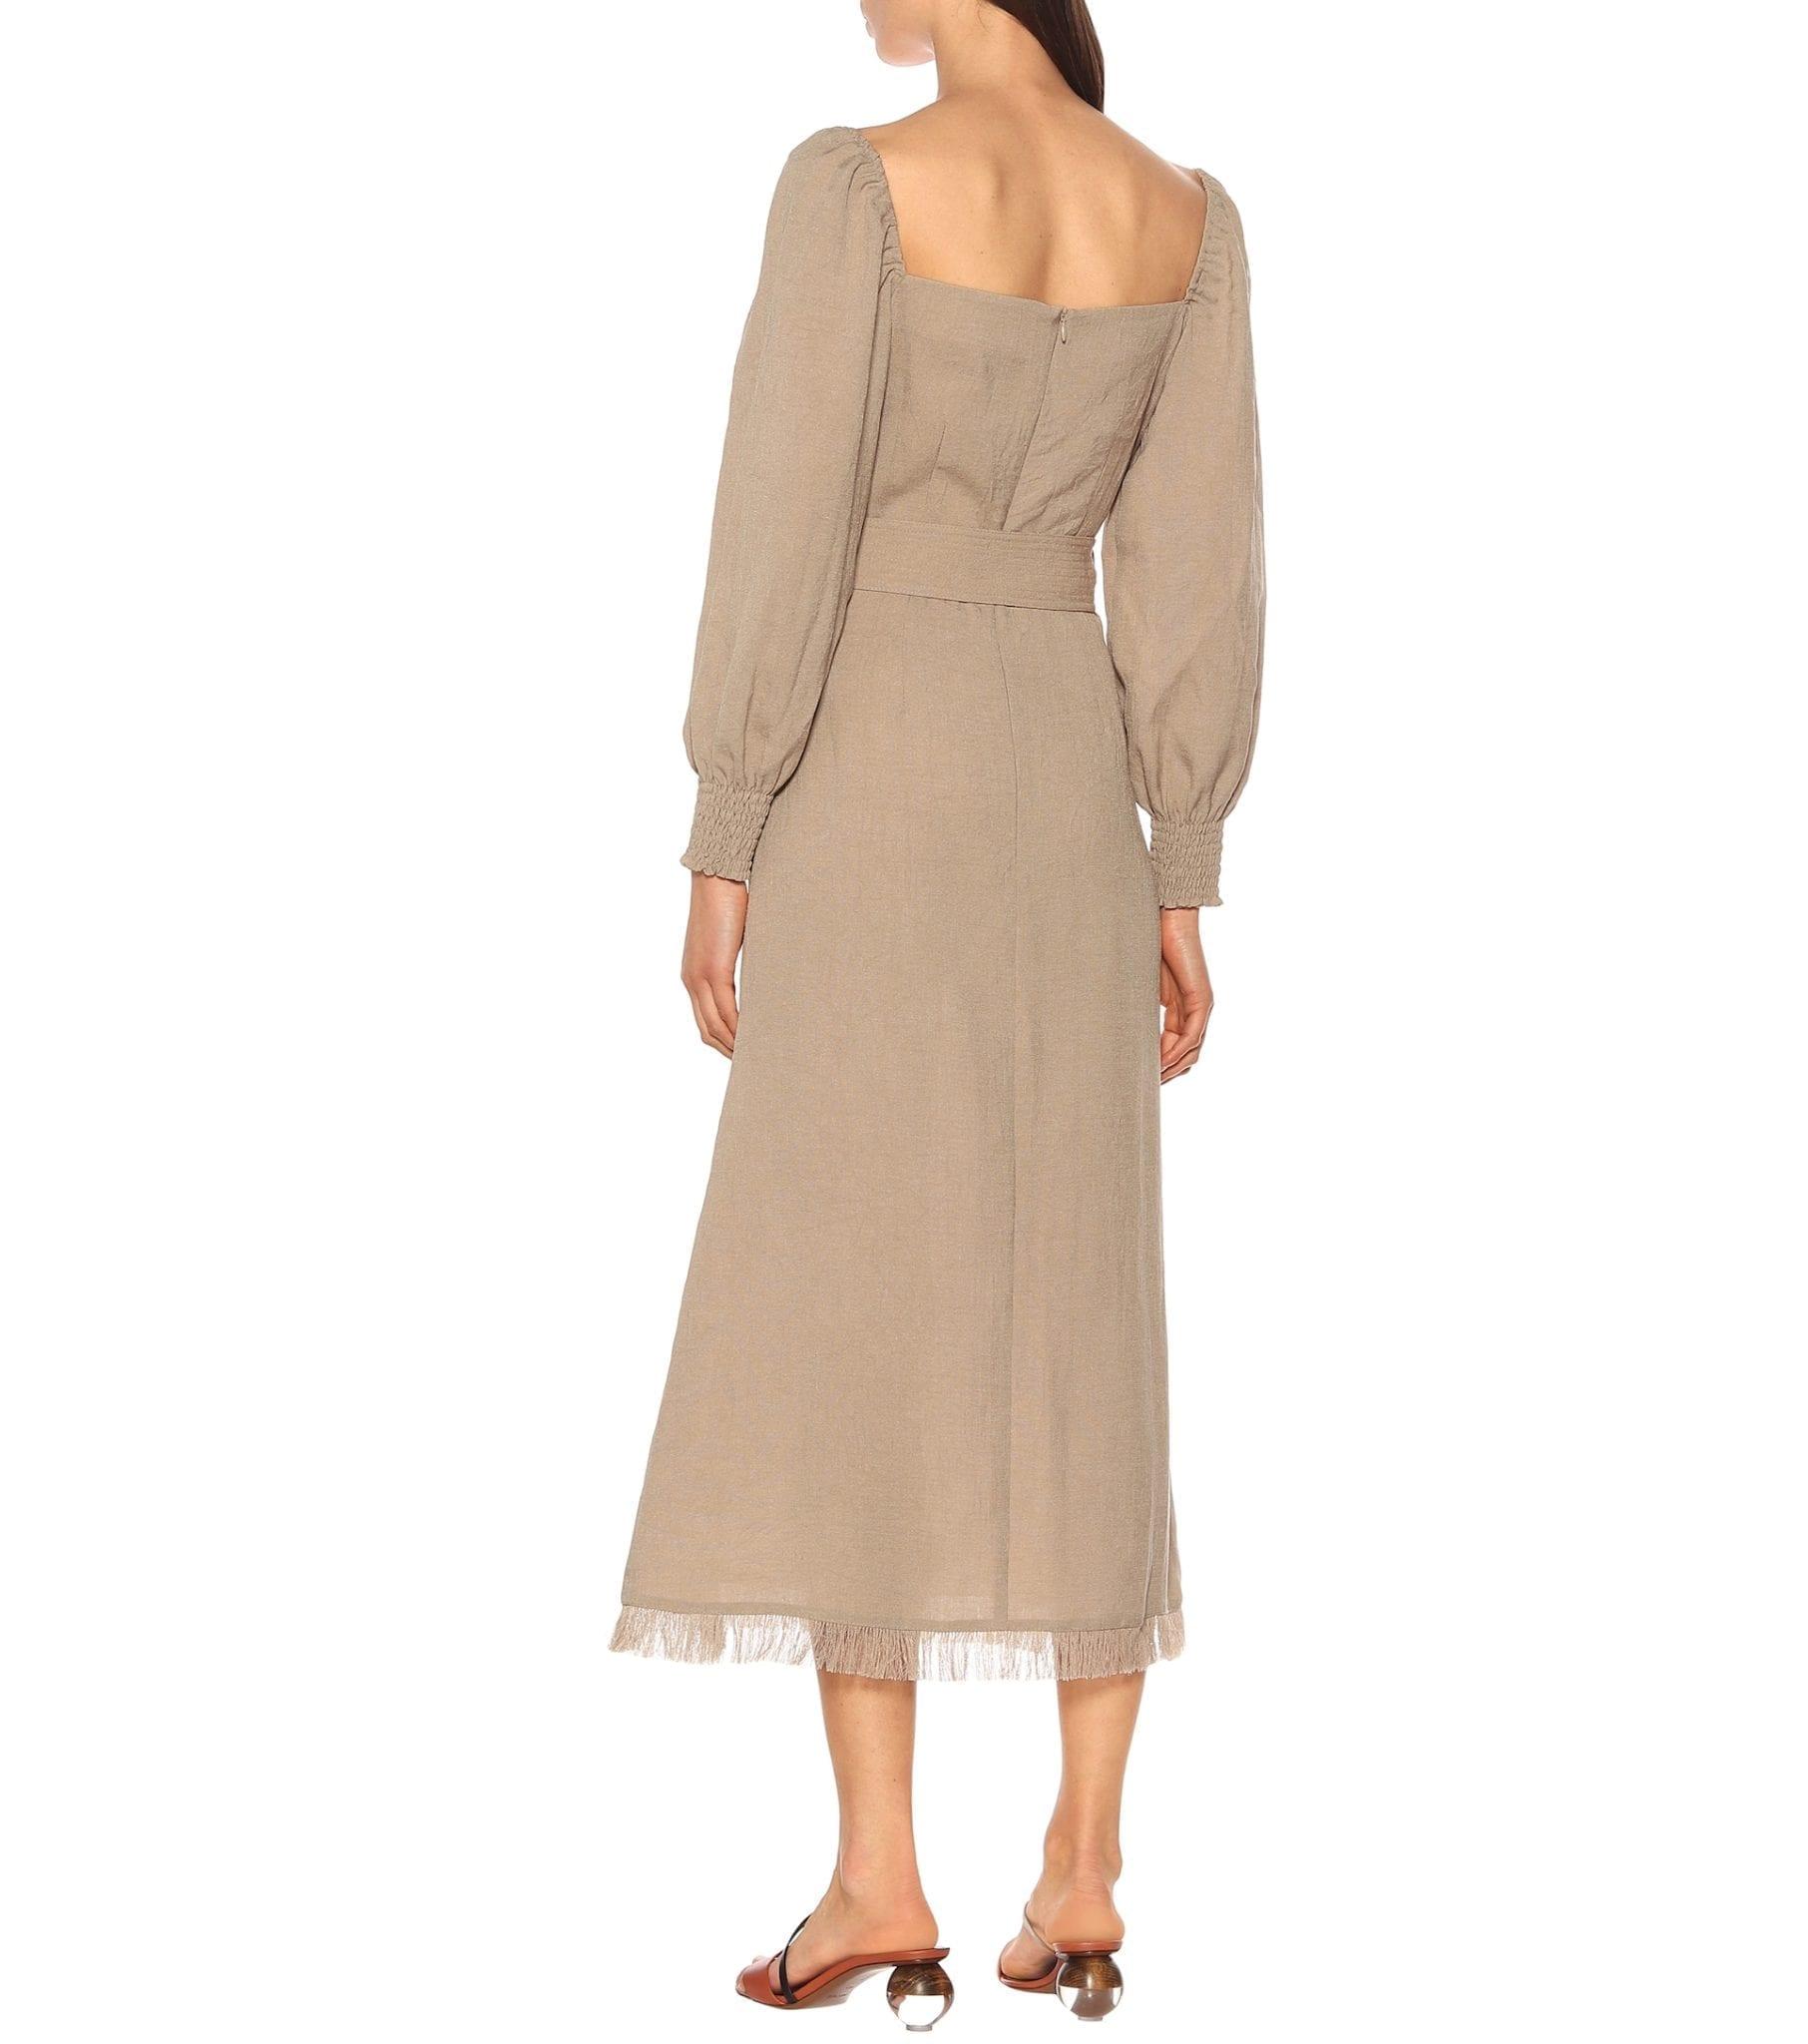 NANUSHKA Exclusive To Mytheresa – Miro Dress